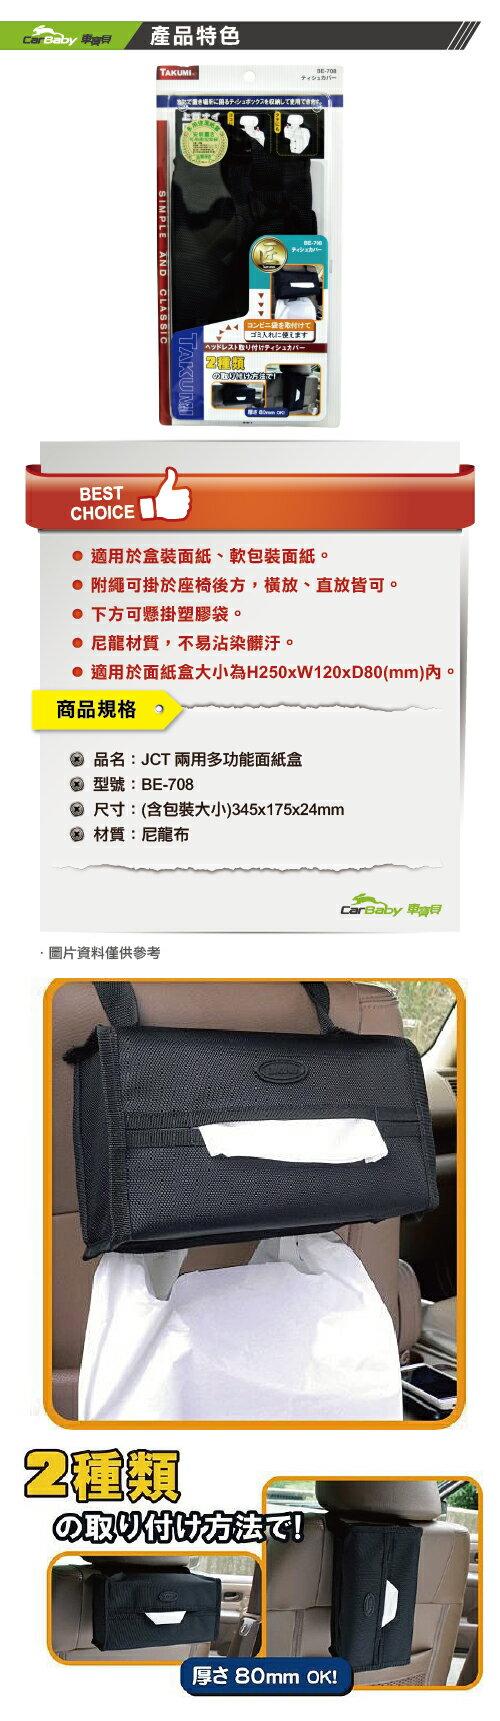 JCT 兩用多功能面紙盒